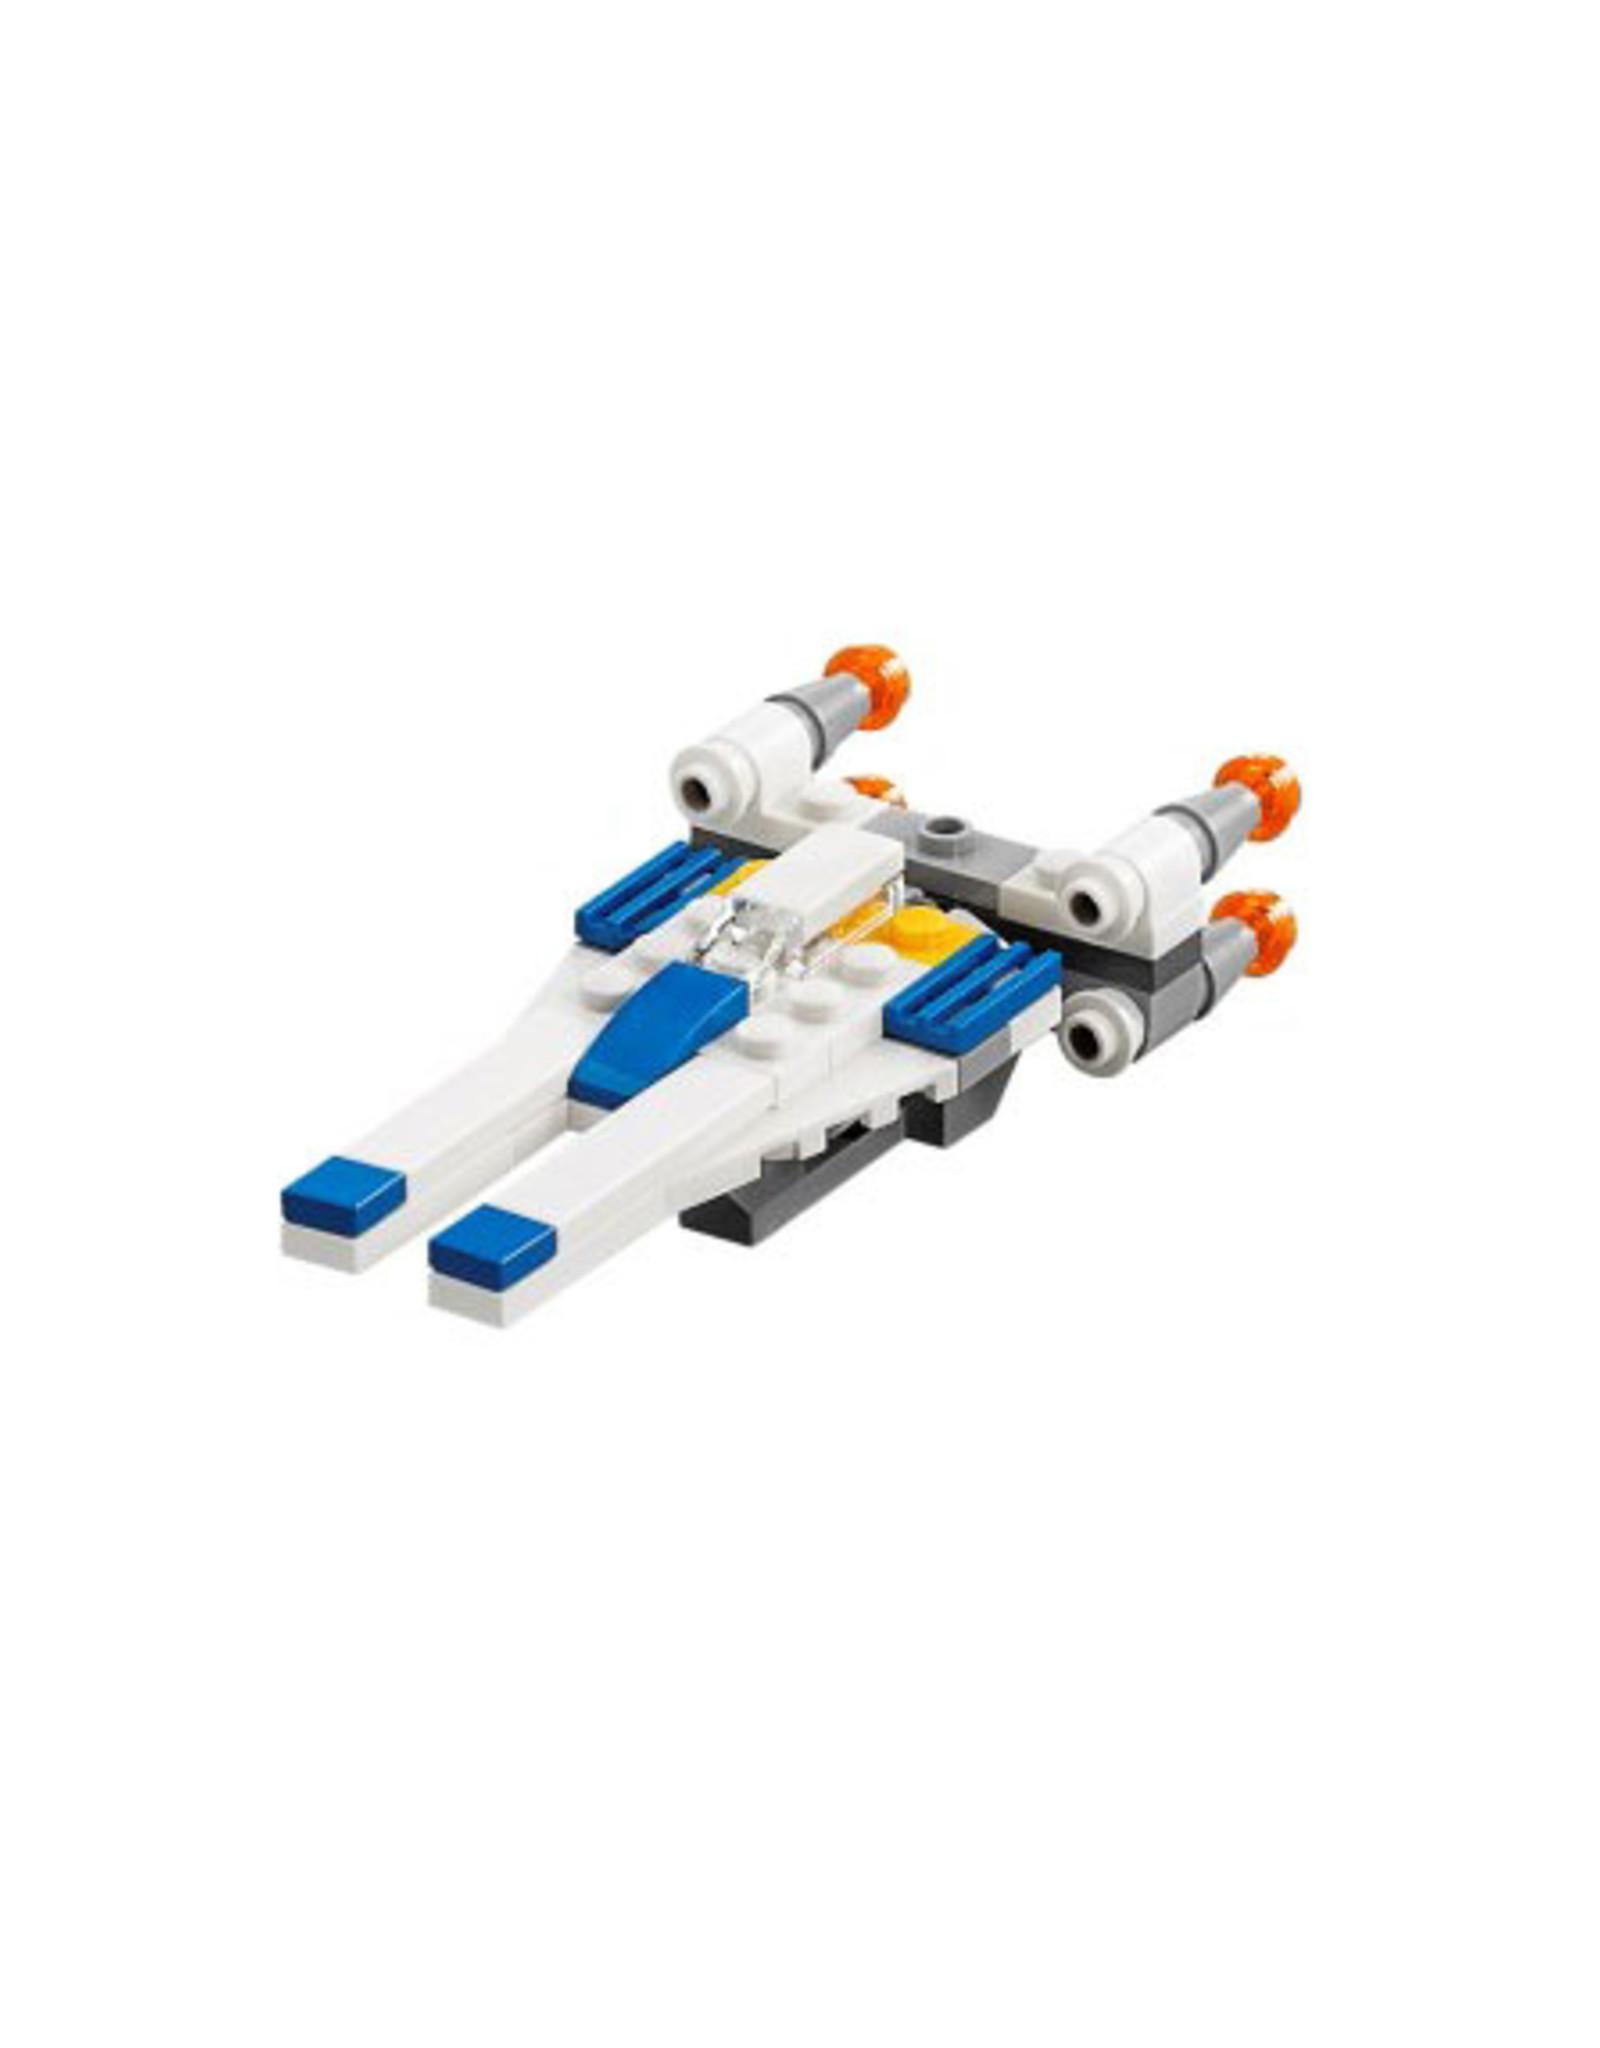 LEGO LEGO 30496 U-Wing Fighter - Mini STAR WARS